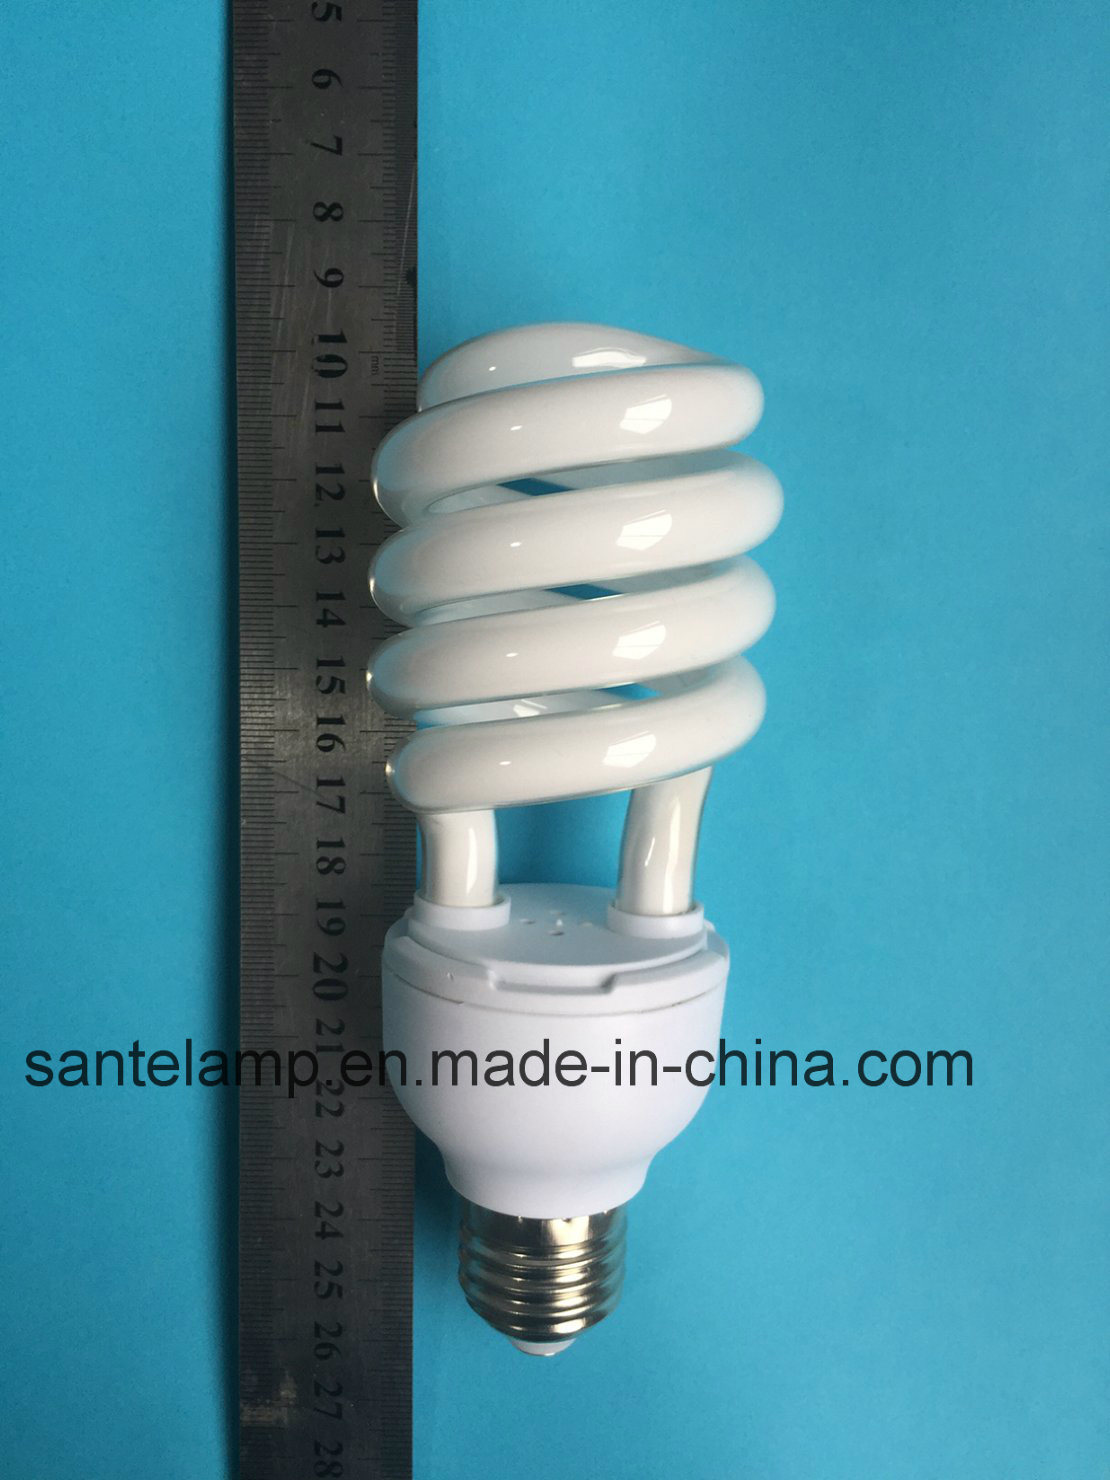 Energy Saving Lamp 24W Half Spiral Halogen/Mixed/Tri-Color 2700k-7500k E27/B22 220-240V